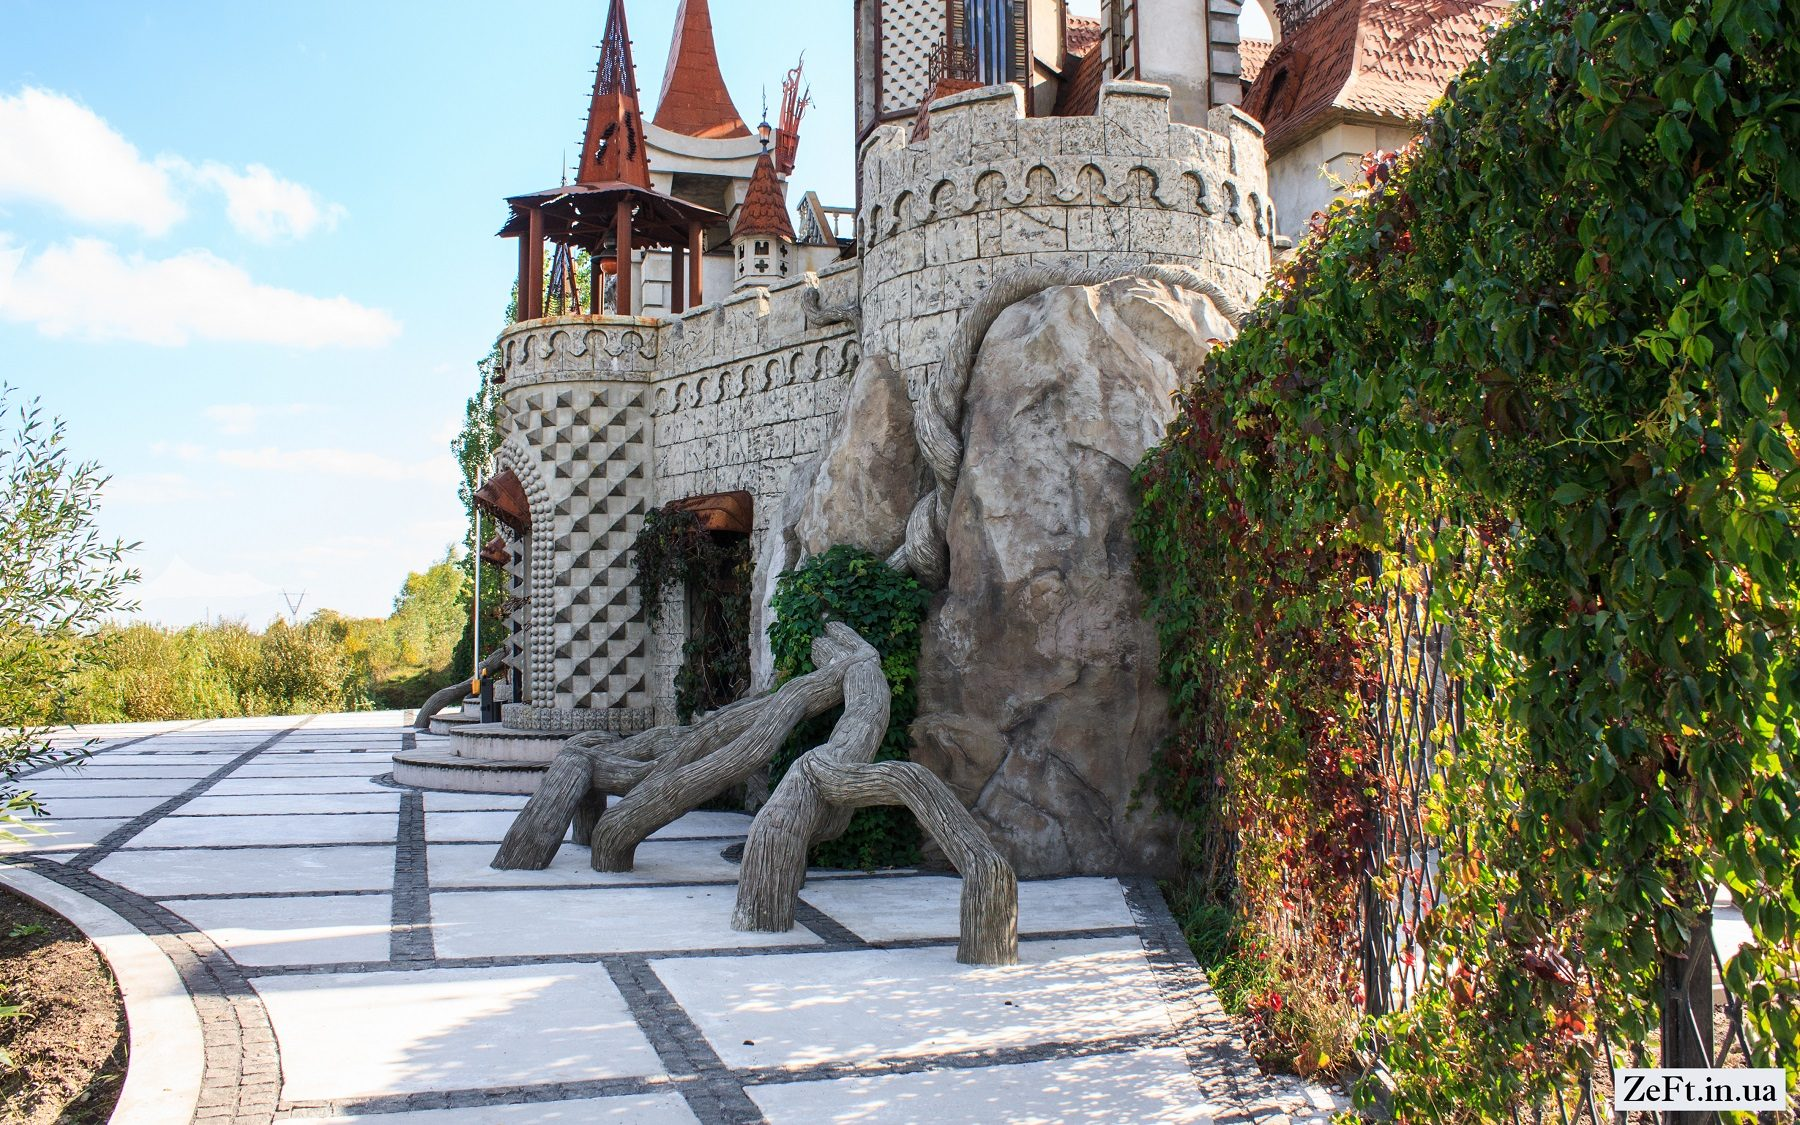 Казковий замок на Київщині -  - Disneyivskij zamok vid kinostudiyi Victoria Film Studios s.Gurivshhina 11 1800x1125